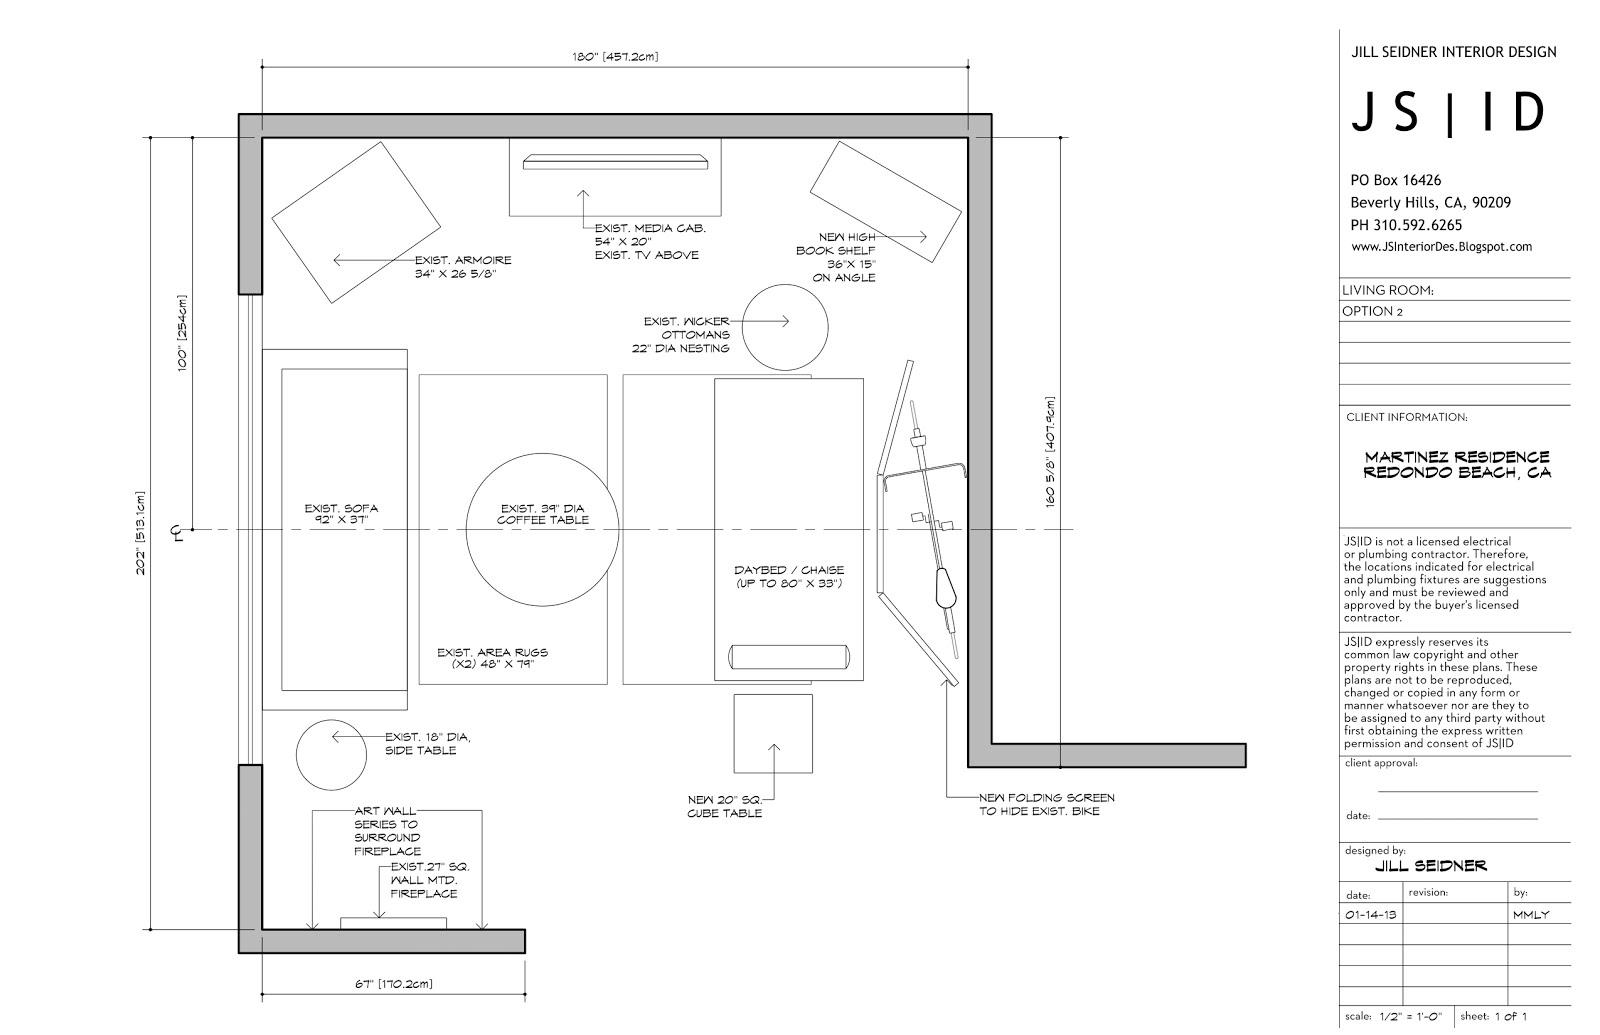 Online Design: E-Decorating & Virtual Interior Design Services title=